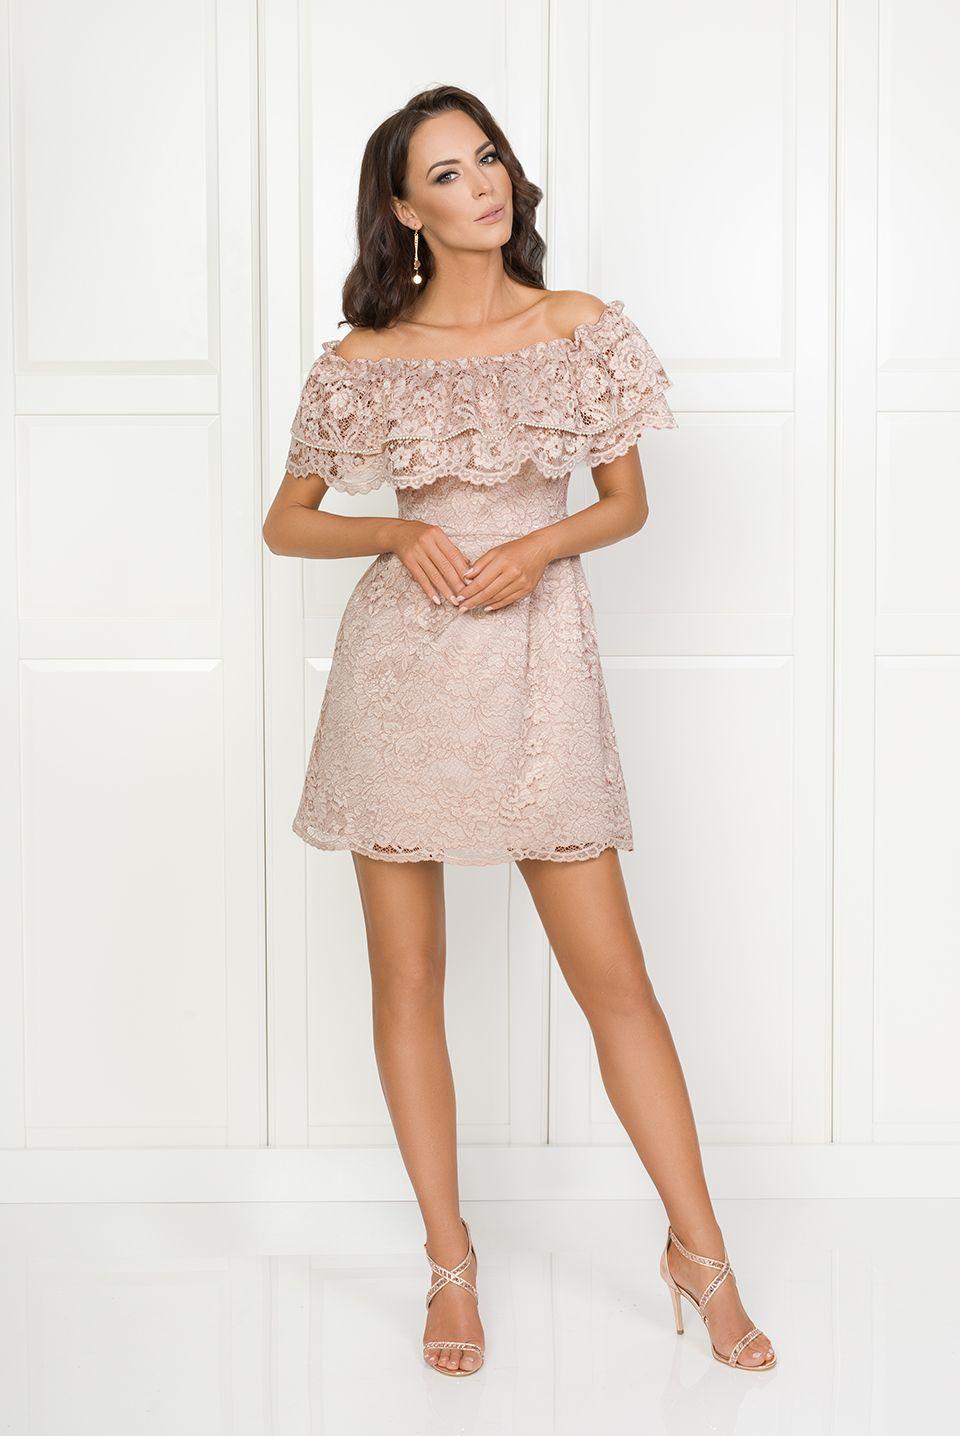 9af5e51d02 Illuminate.pl Luna - Koronkowa sukienka z dekoltem typu carmen